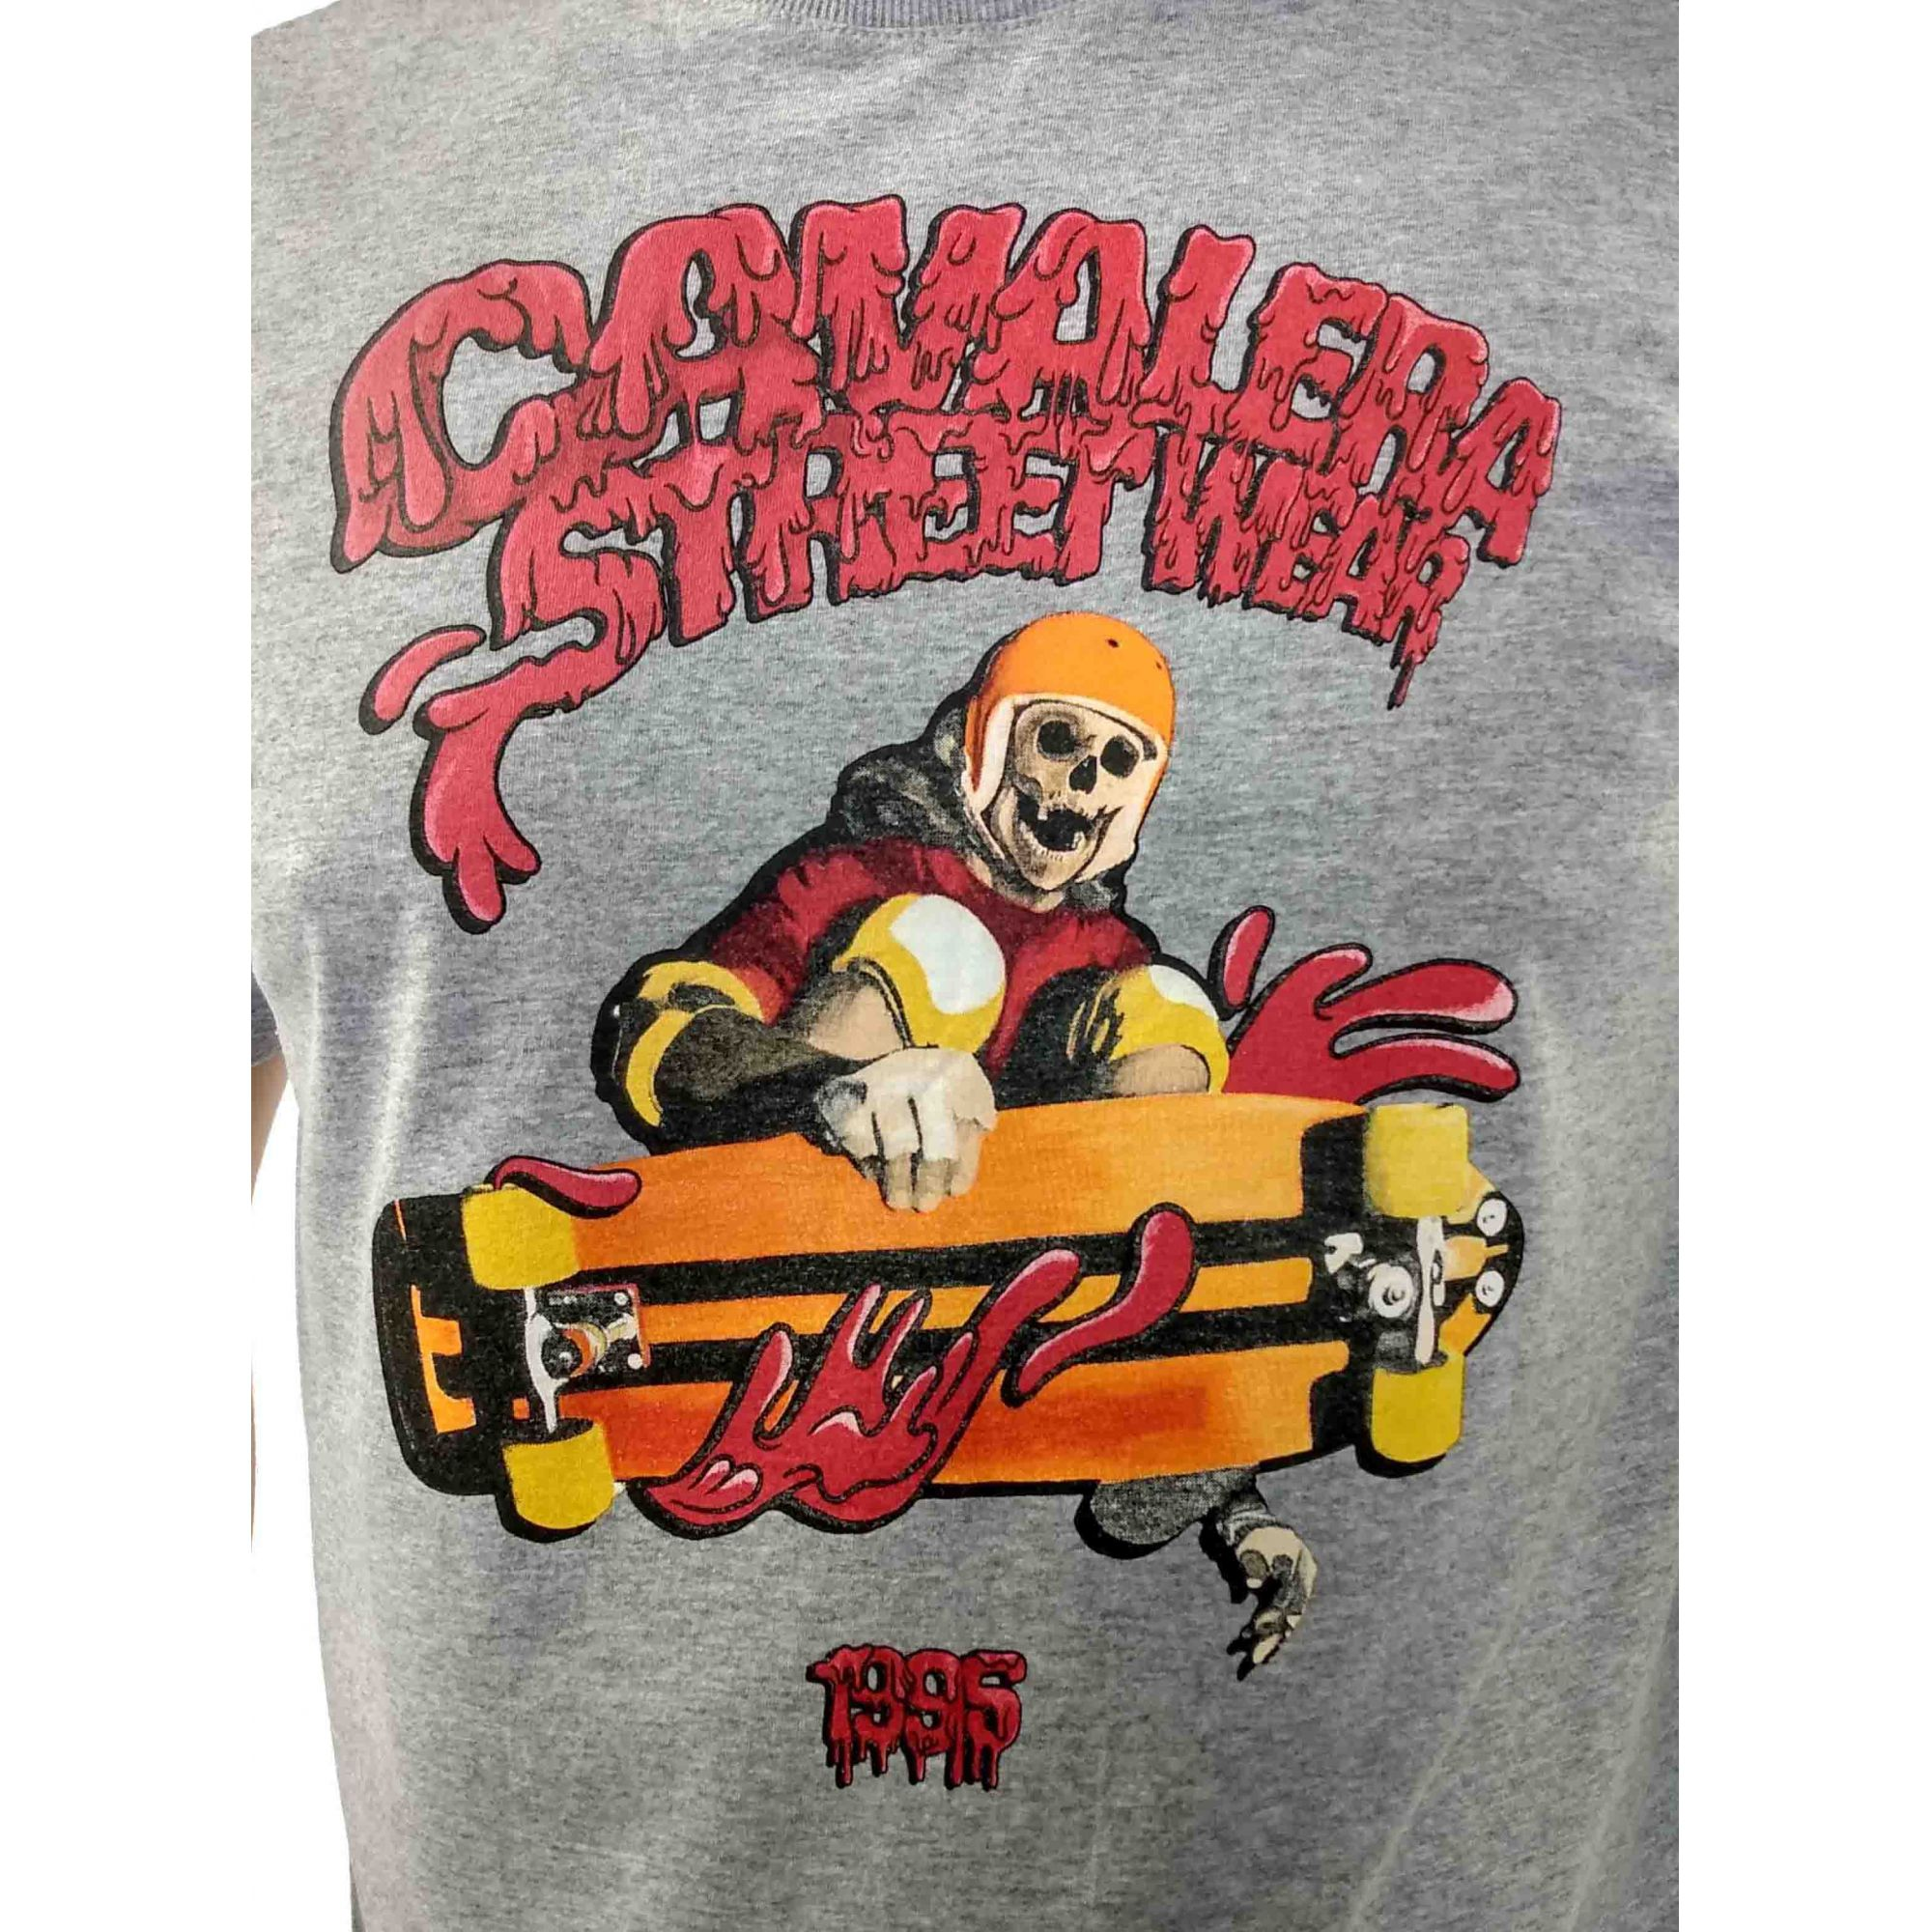 Camiseta Cavalera Masculina Esqueleto Skate Street Wear